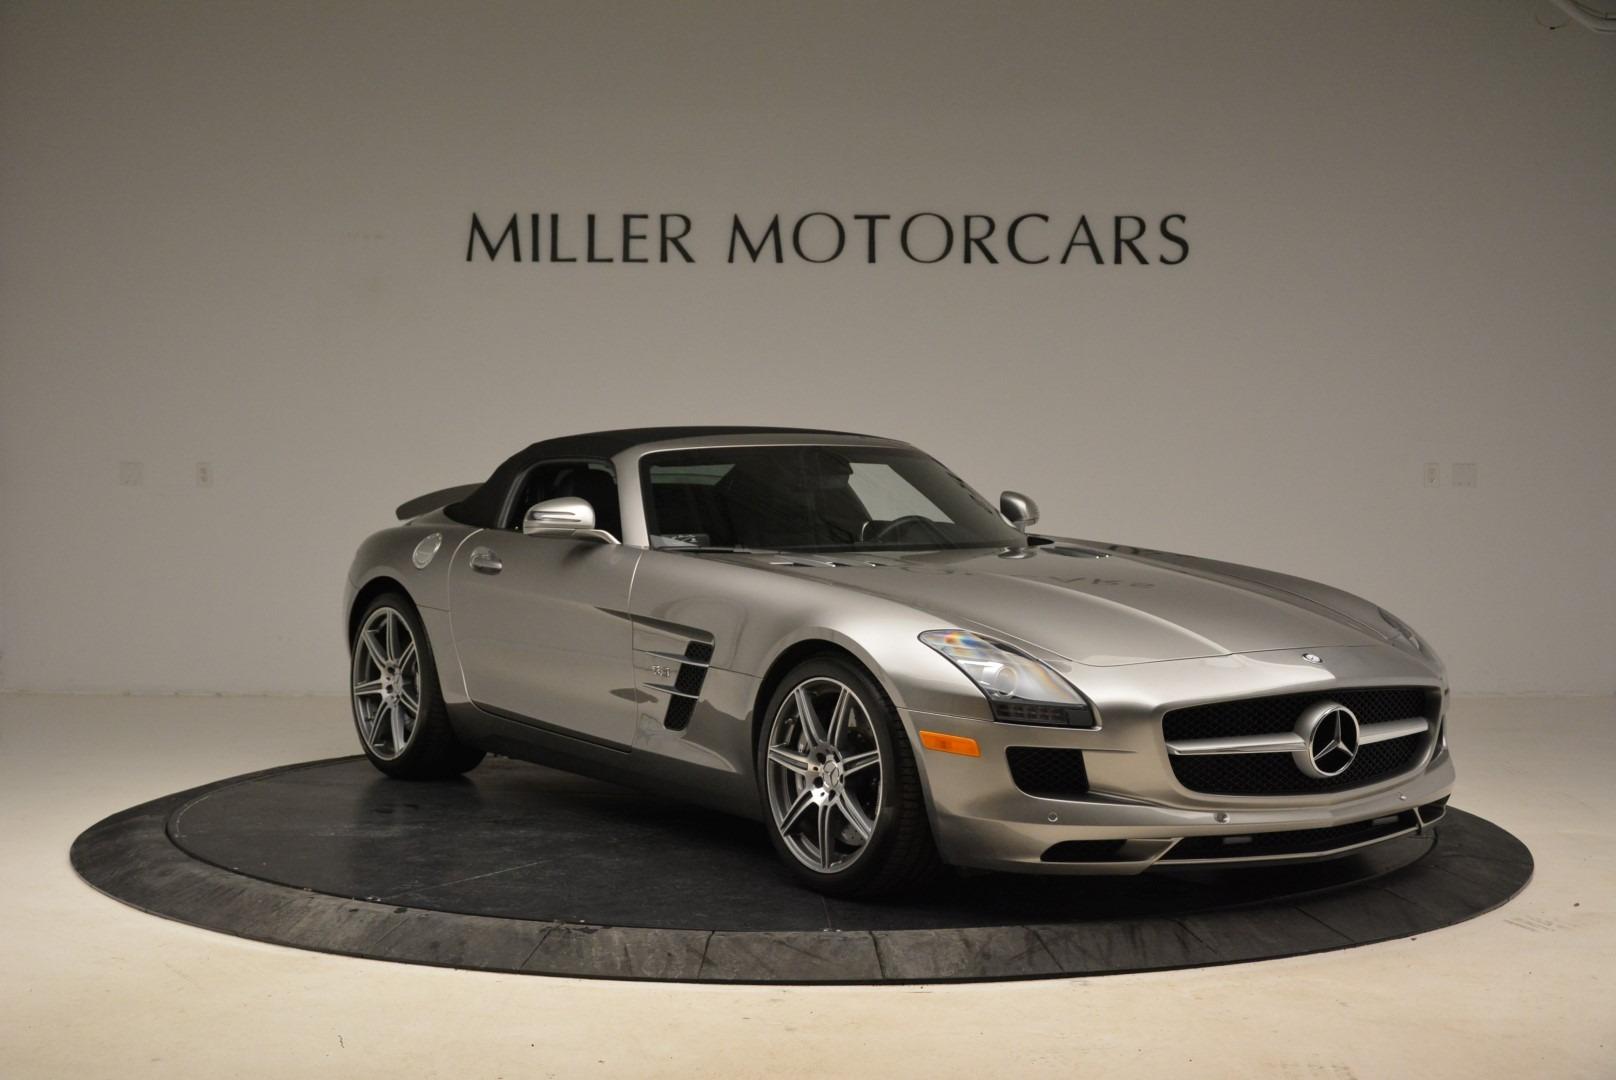 Used 2012 Mercedes-Benz SLS AMG  For Sale In Westport, CT 2068_p19